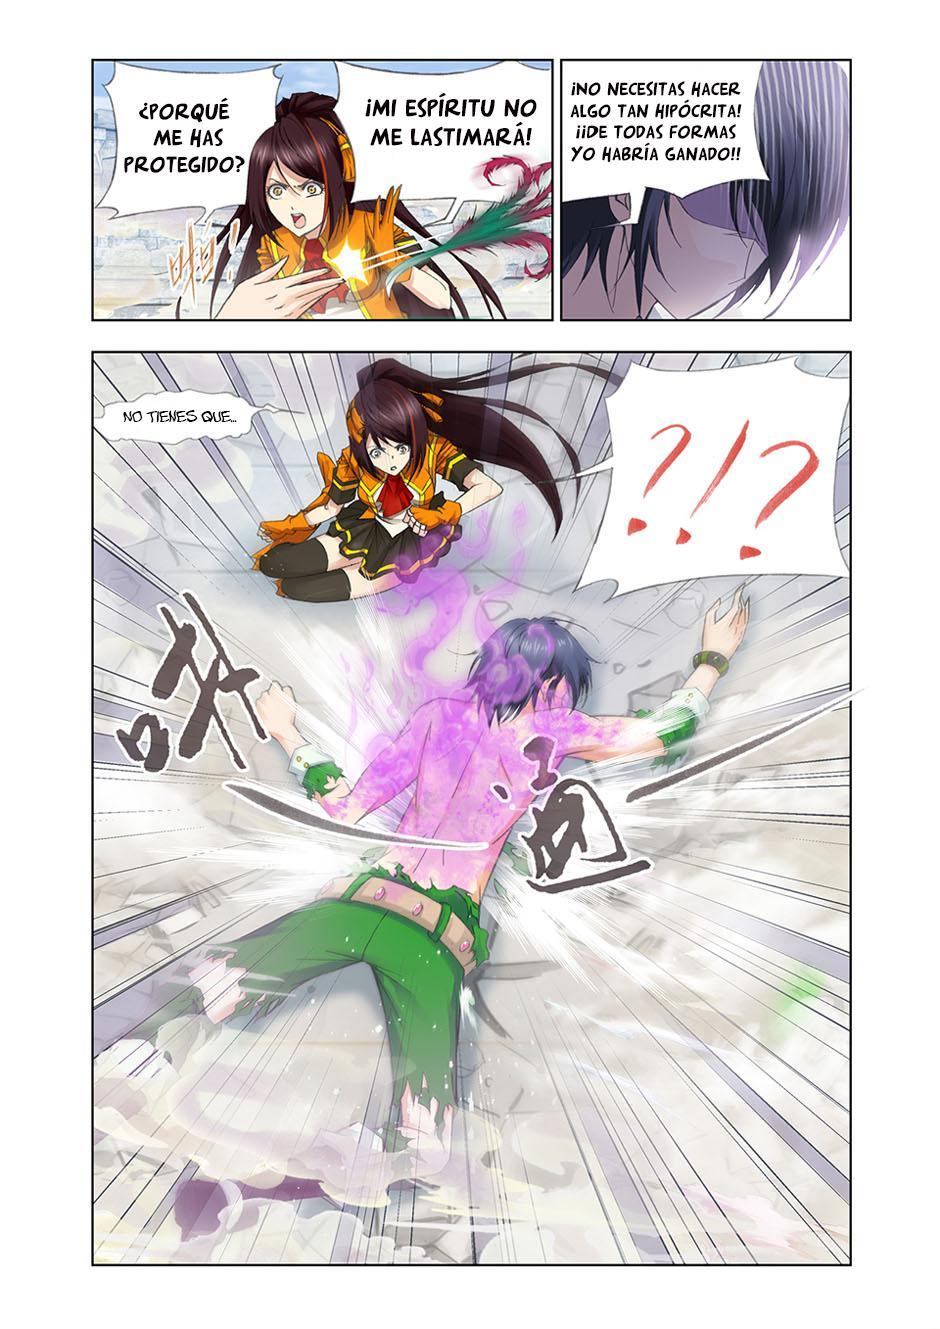 http://c5.ninemanga.com/es_manga/18/16210/417583/76128f896de3c07b84f60965327751a3.jpg Page 10